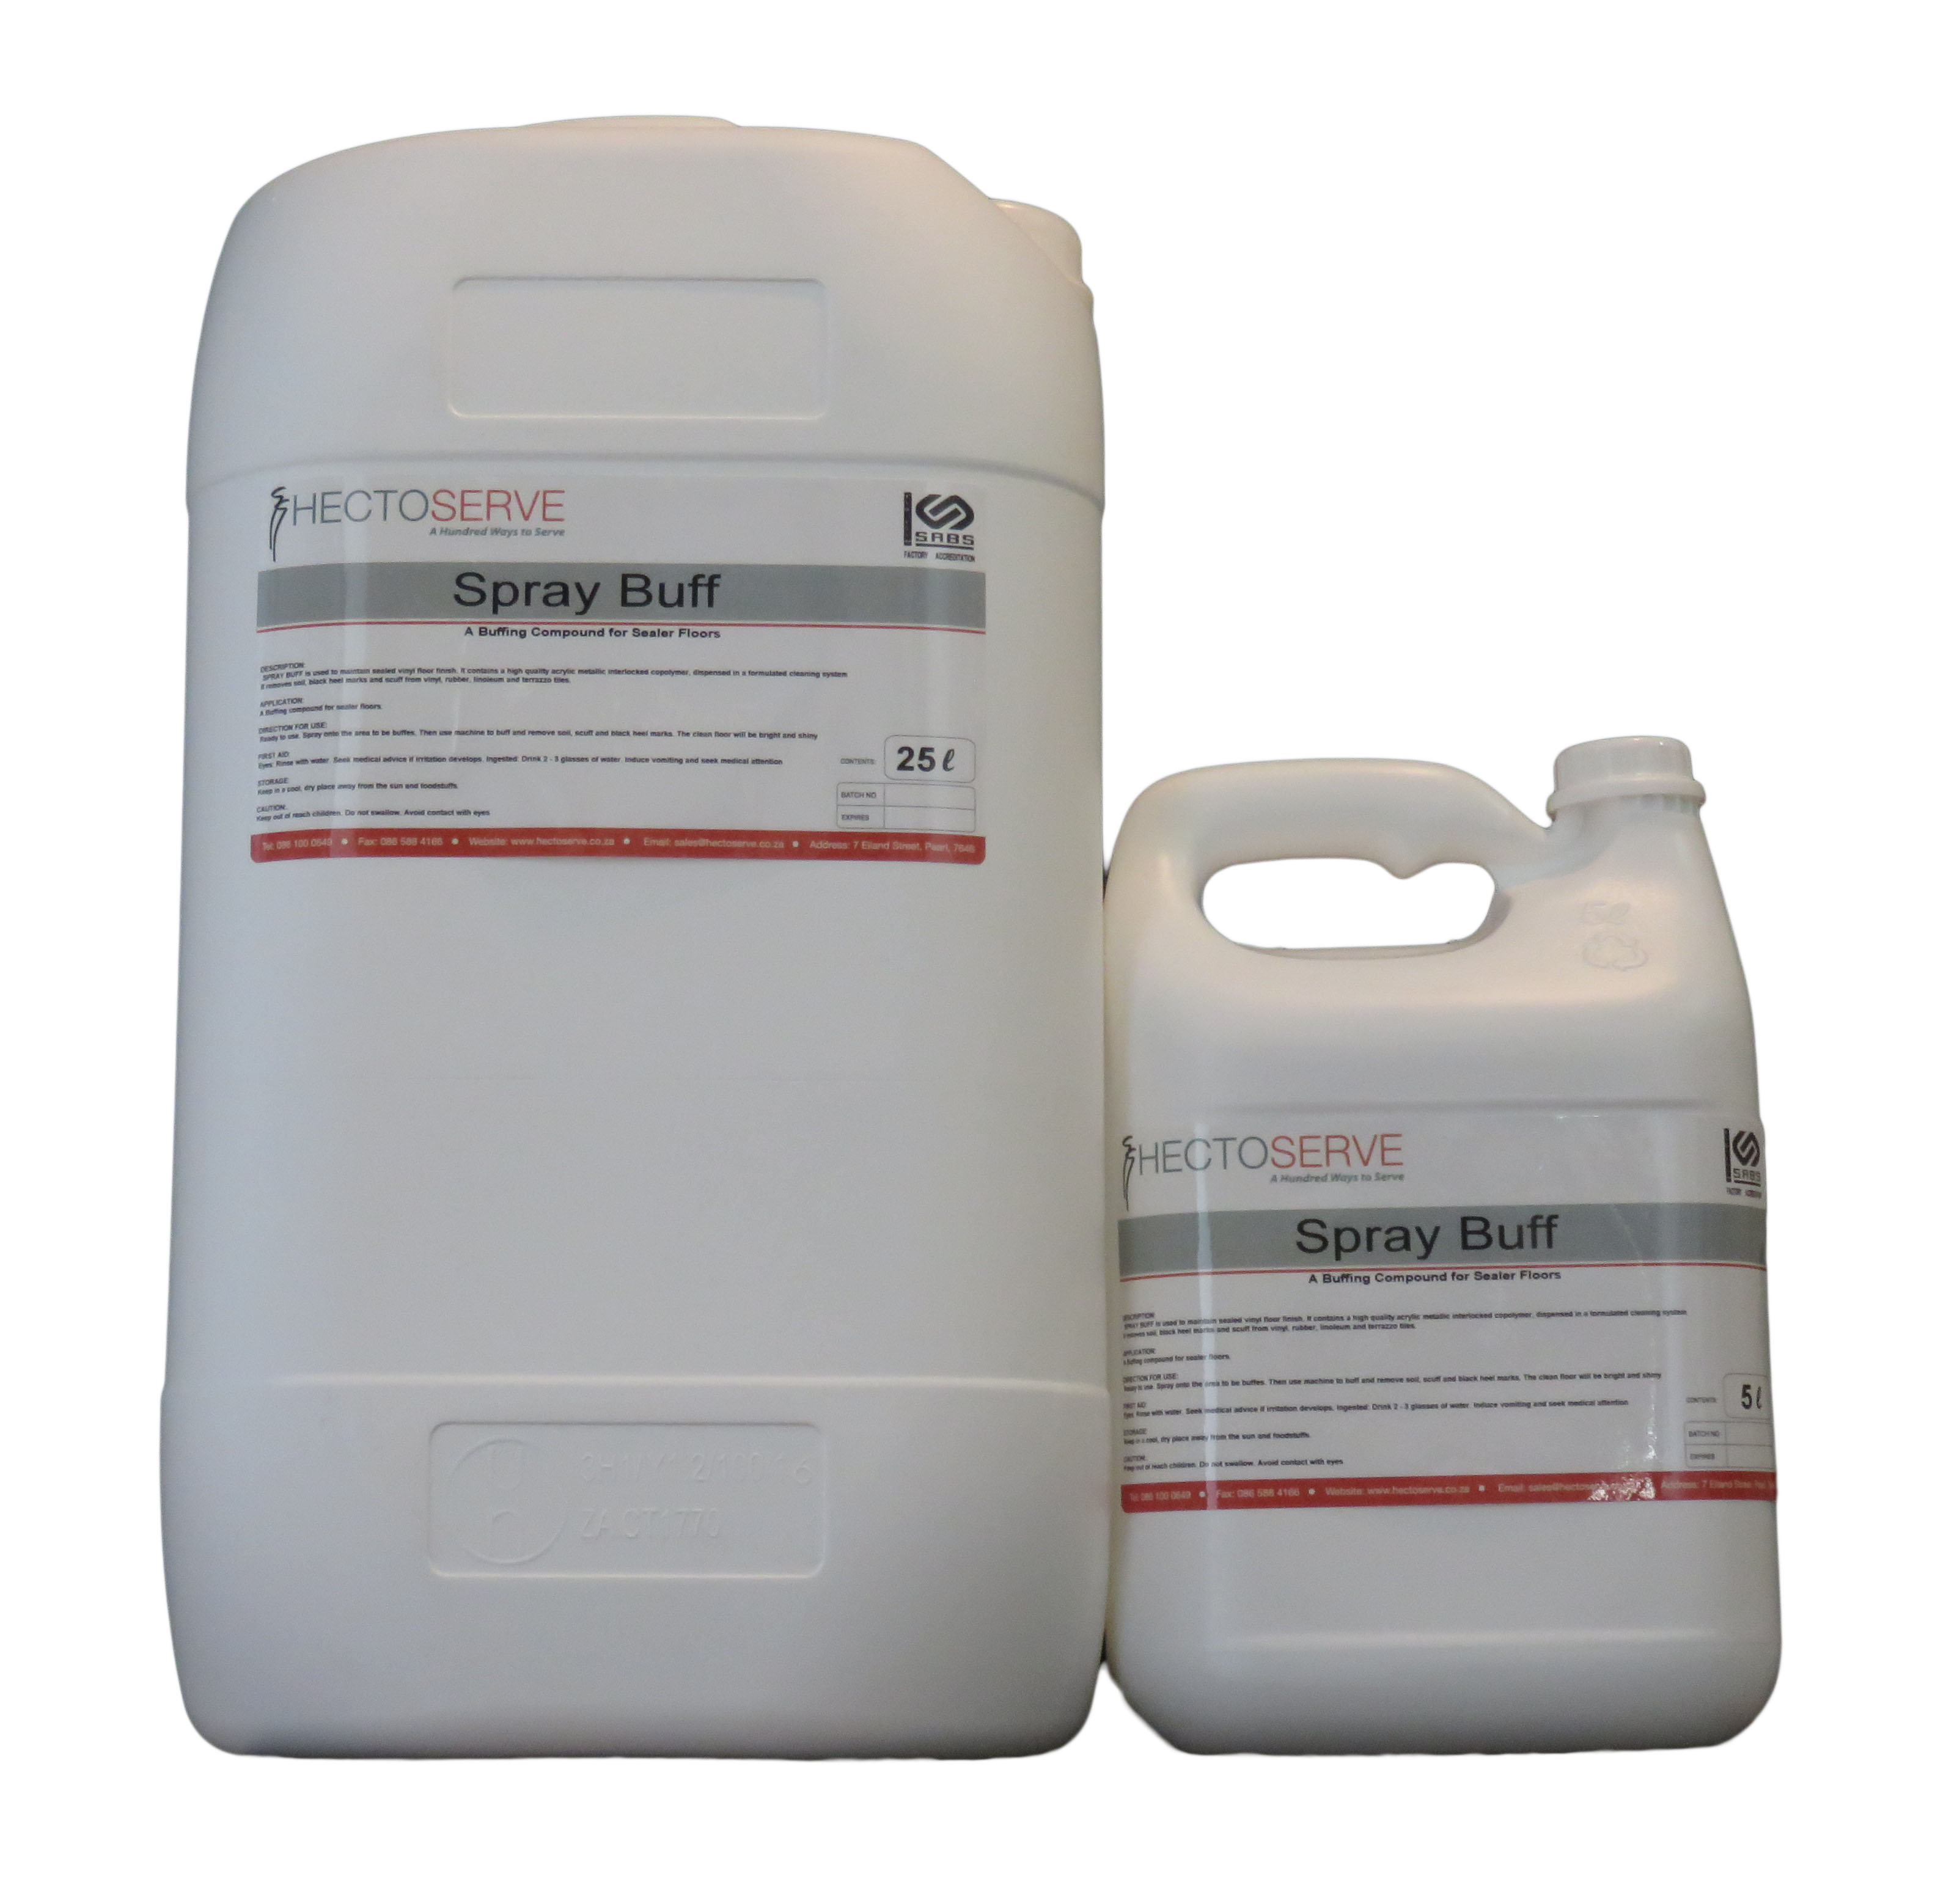 Hectoserve Spray Buff Floor Polymer